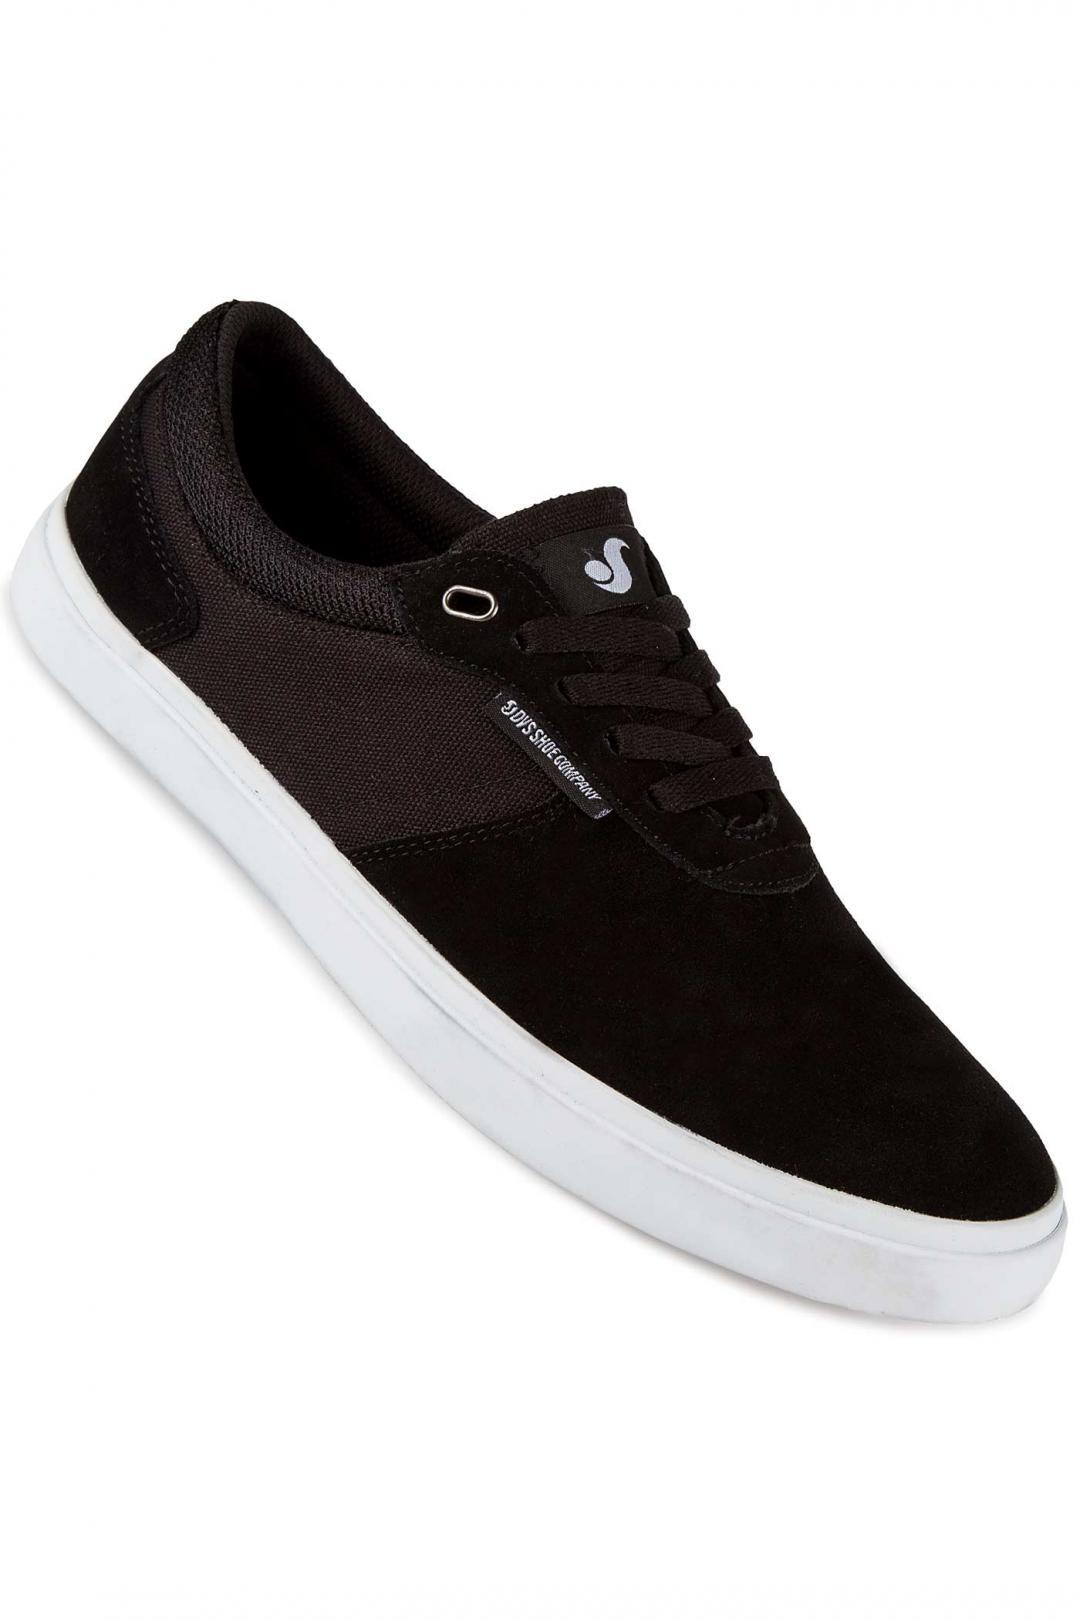 Uomo DVS Merced Suede black white   Sneaker